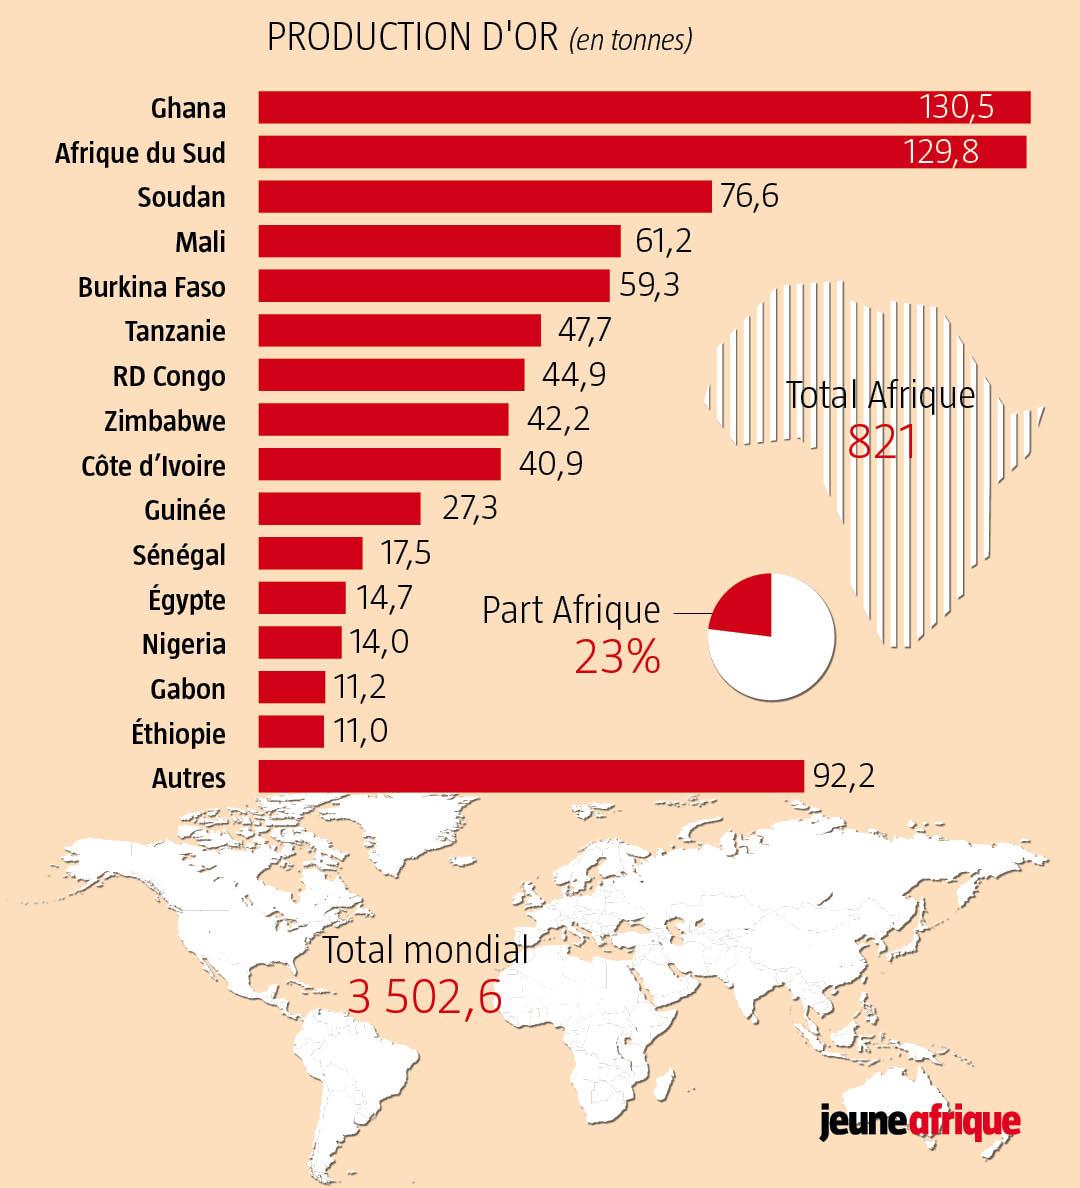 Production d'or des pays africains